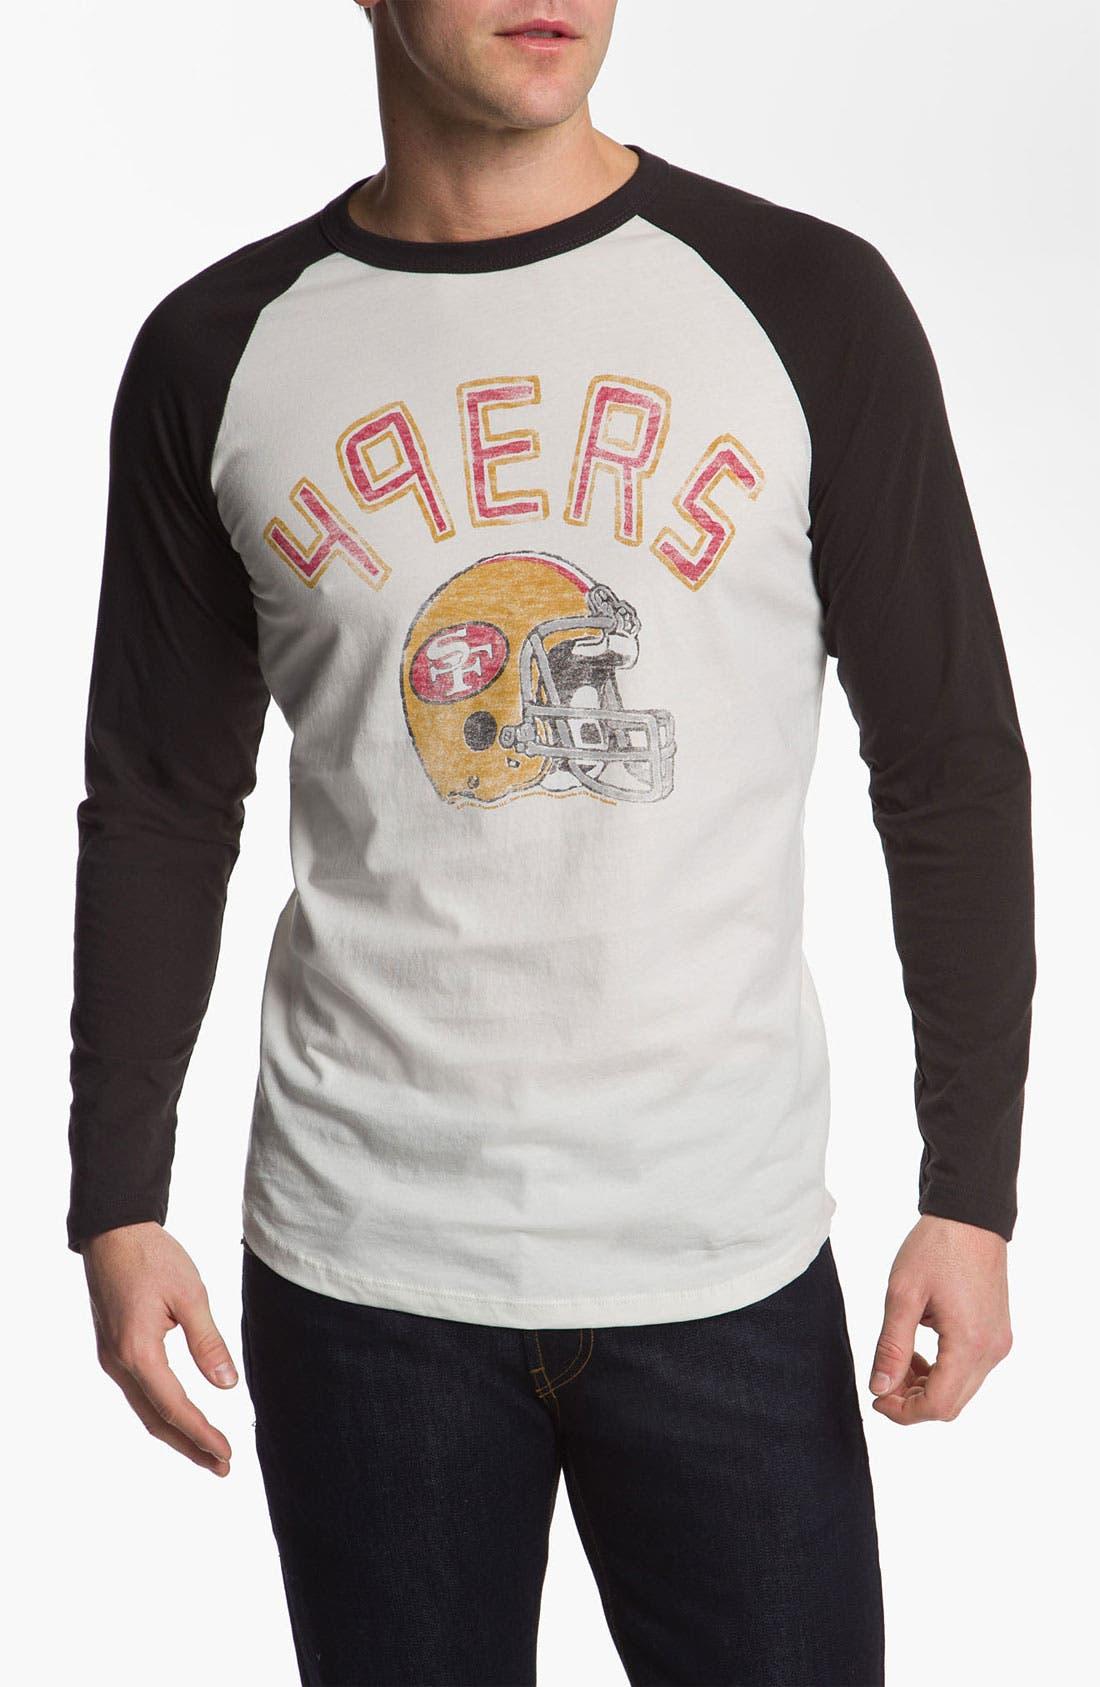 Alternate Image 1 Selected - Junk Food 'San Francisco 49ers' Raglan Sleeve T-Shirt